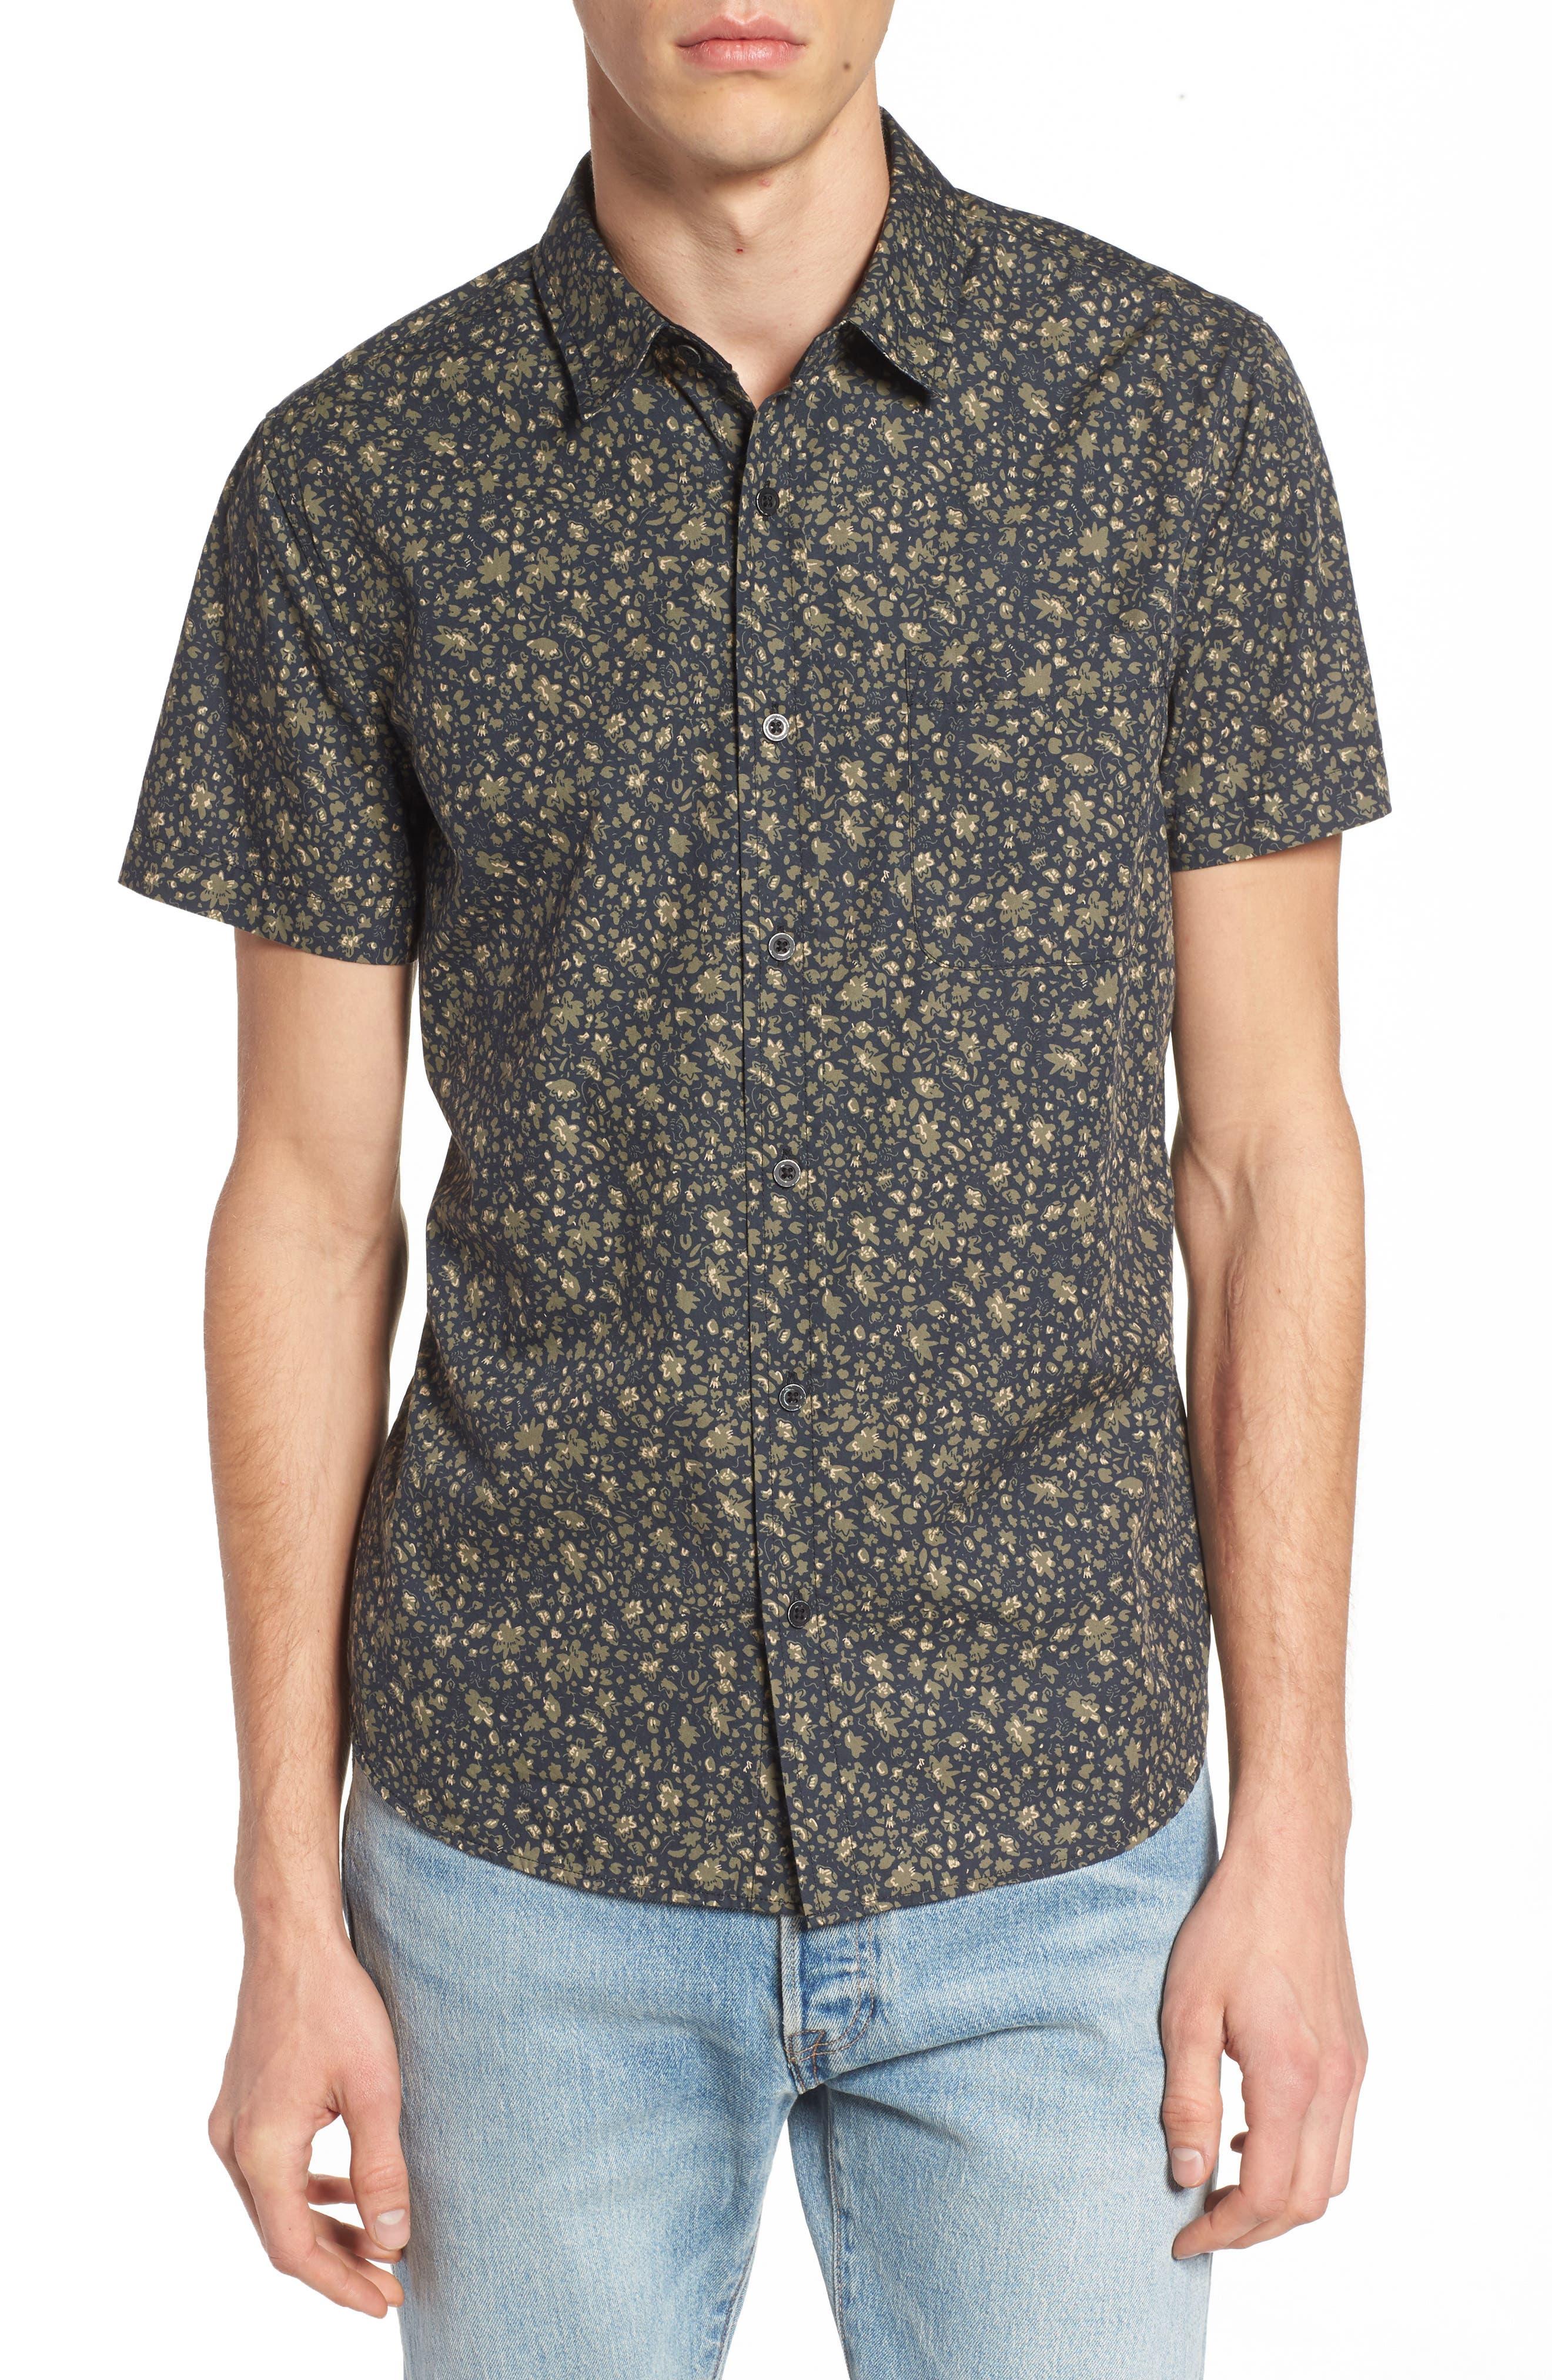 Nash Slim Fit Print Sport Shirt,                             Main thumbnail 1, color,                             Floral Camo Black/ Ivy